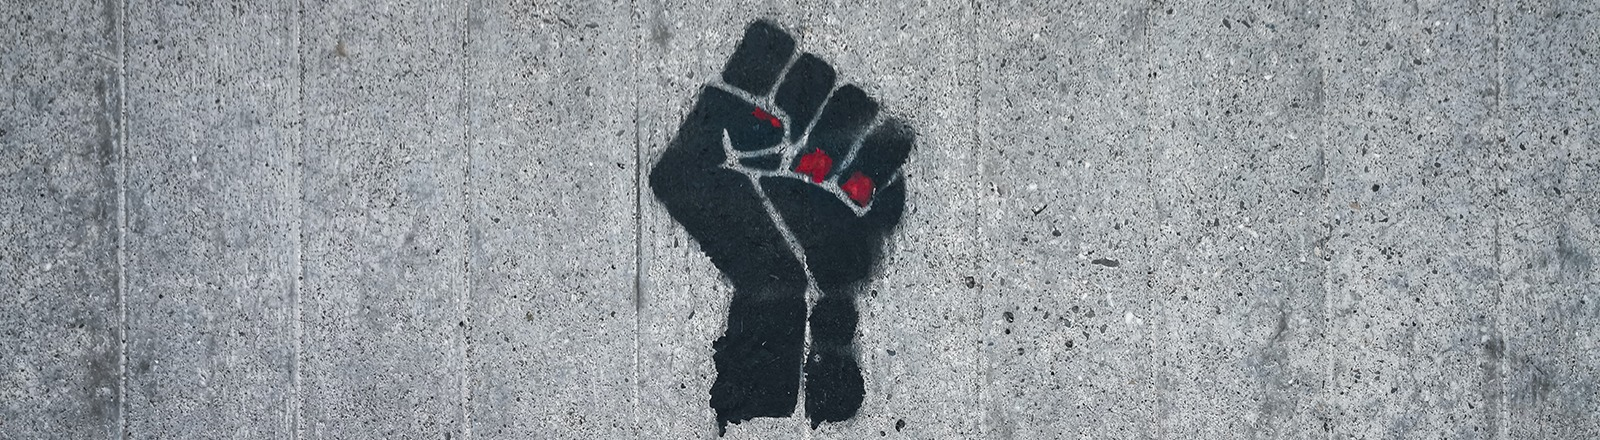 Graffiti einer schwarzen Faust, jemand hat die Nägel rot lackiert.